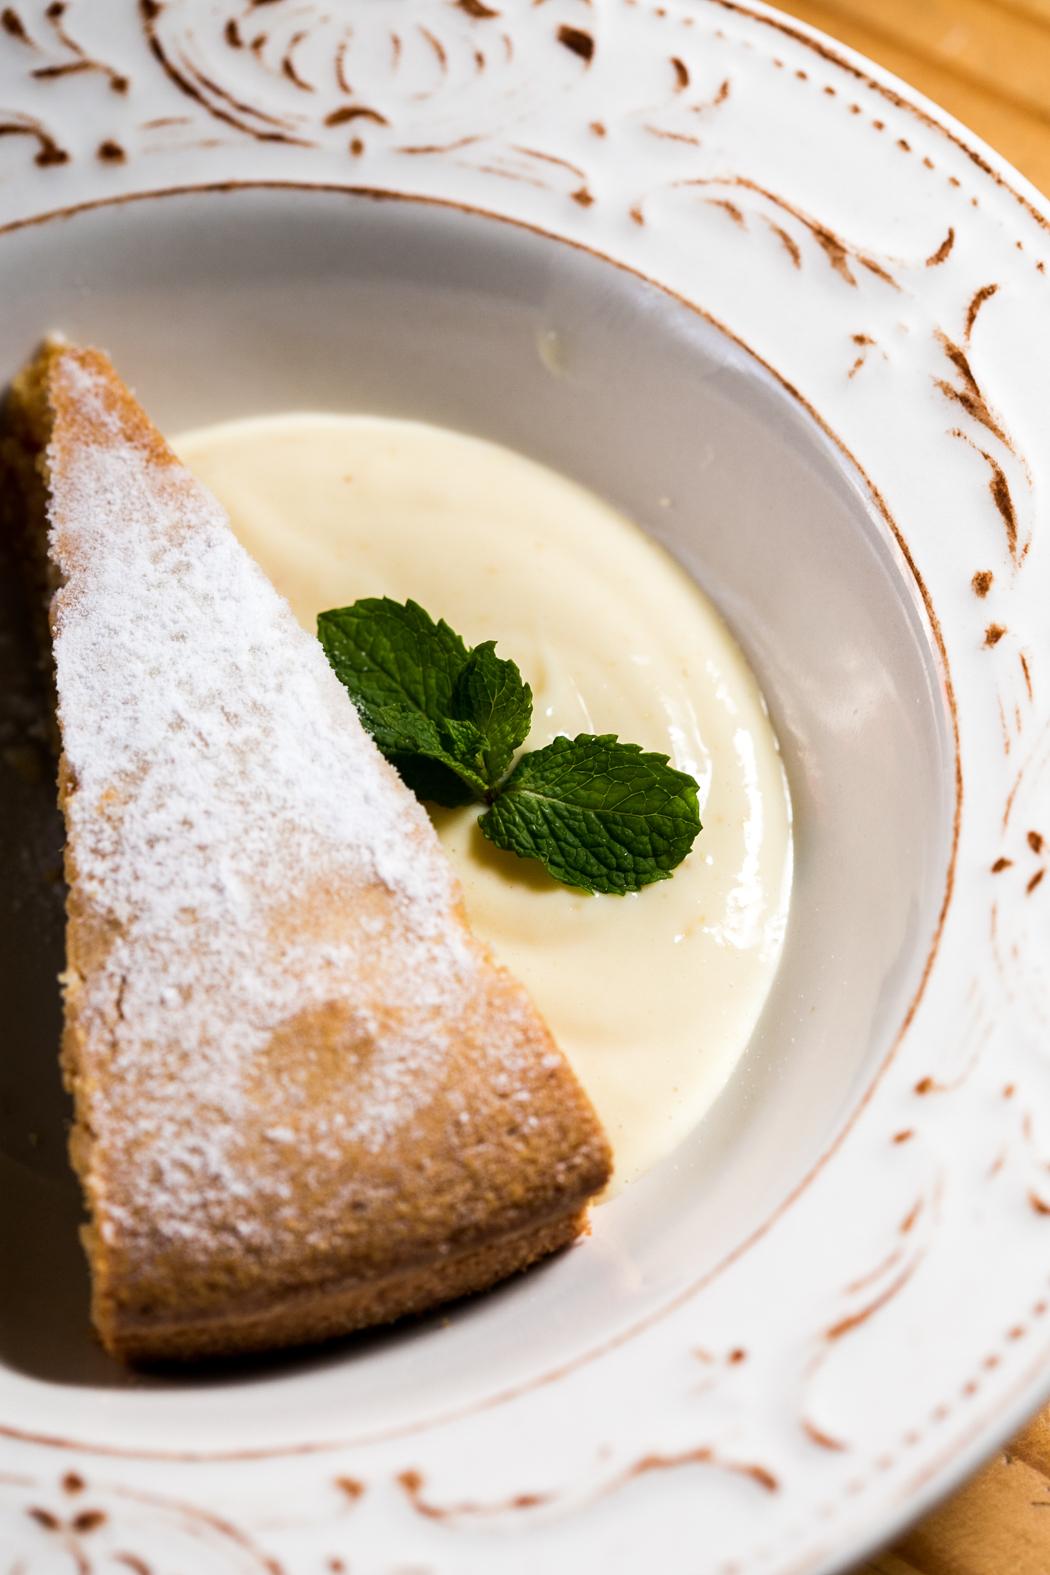 torta_santiago_sorvete_pacoca